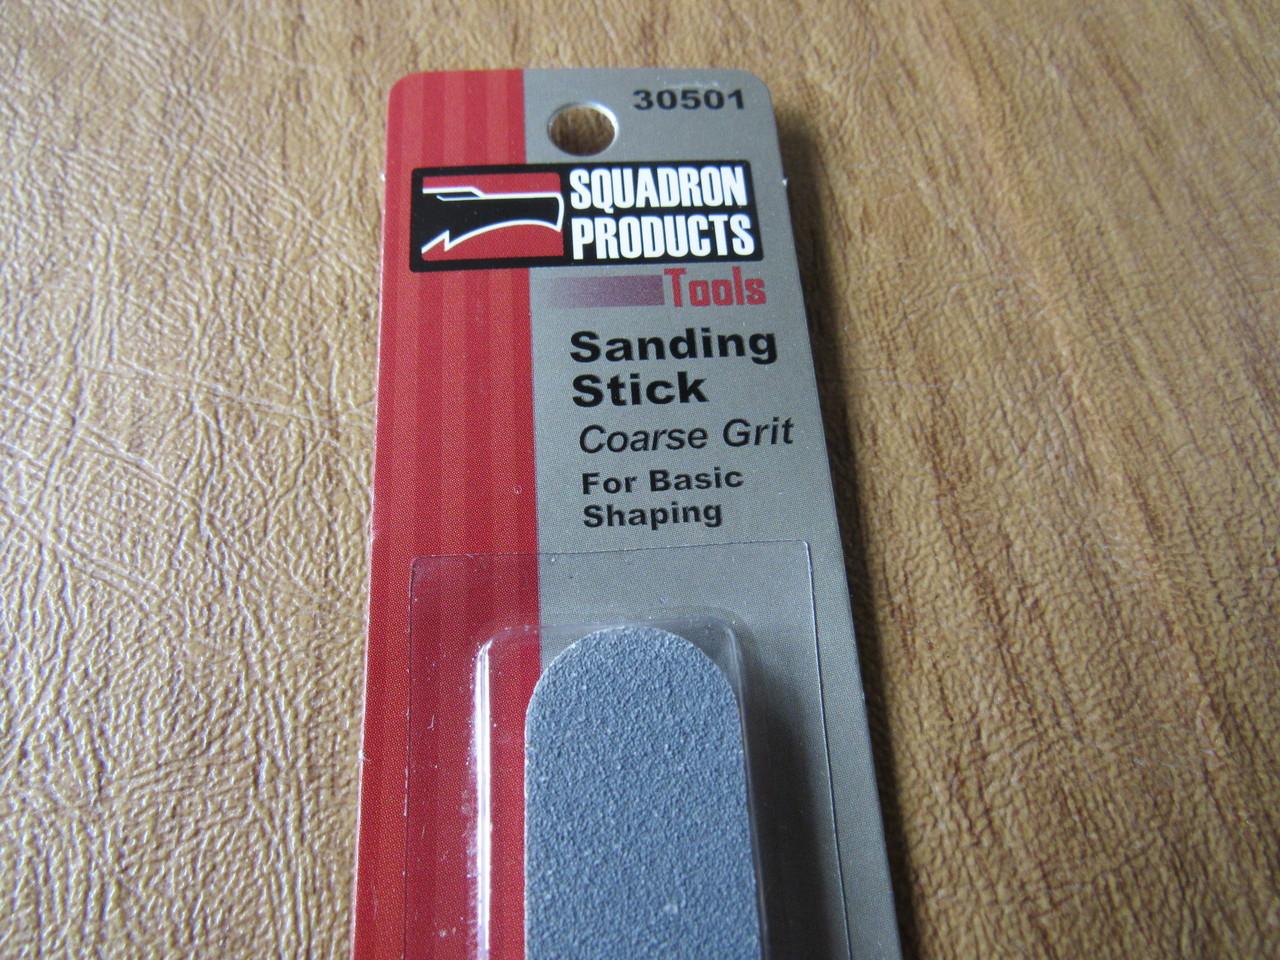 Coarse grit. Squadron tools 30501 sanding stick